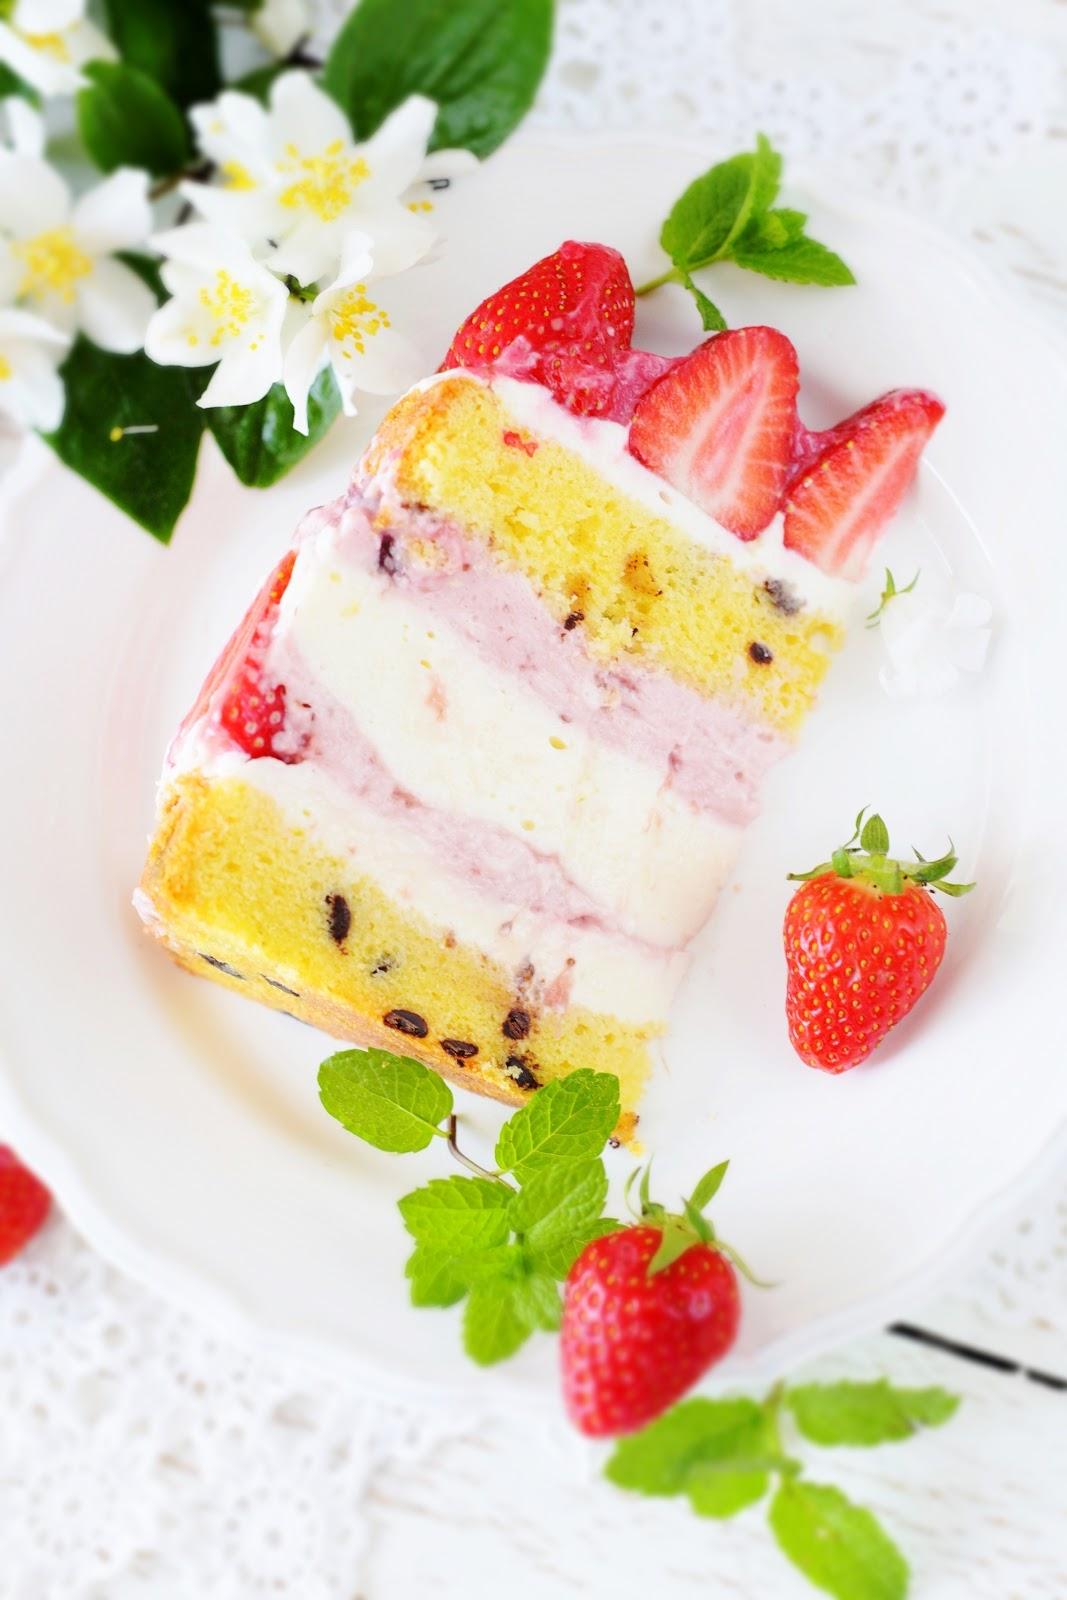 kessy 39 s pink sugar erdbeer stracciatella torte. Black Bedroom Furniture Sets. Home Design Ideas